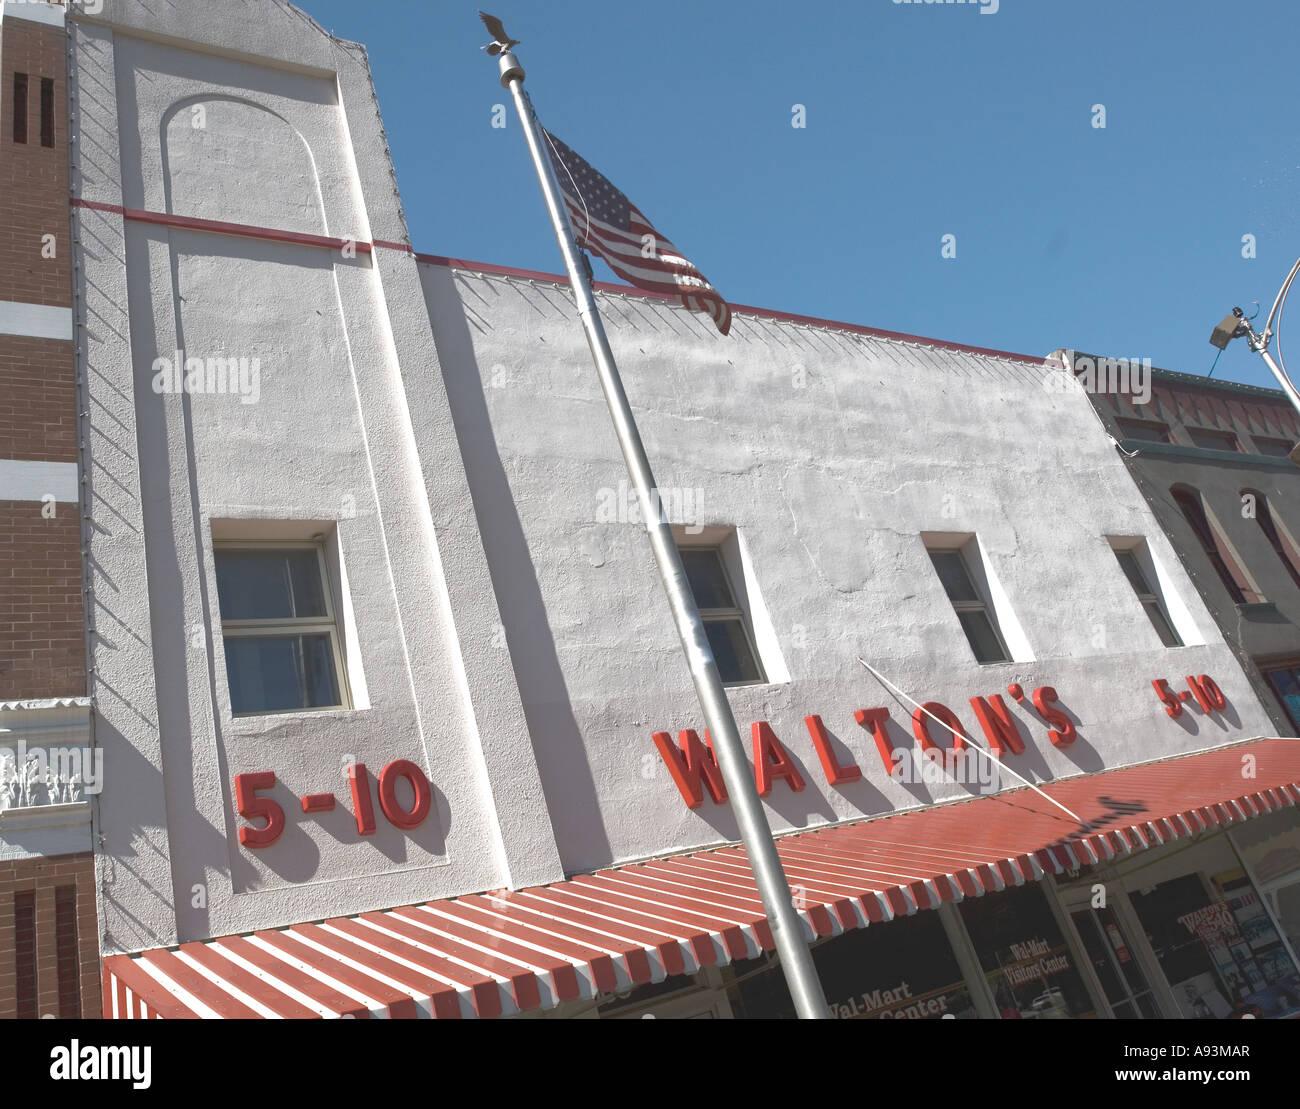 Wal Mart Bentonville Arkansas Stock Photos & Wal Mart Bentonville ...